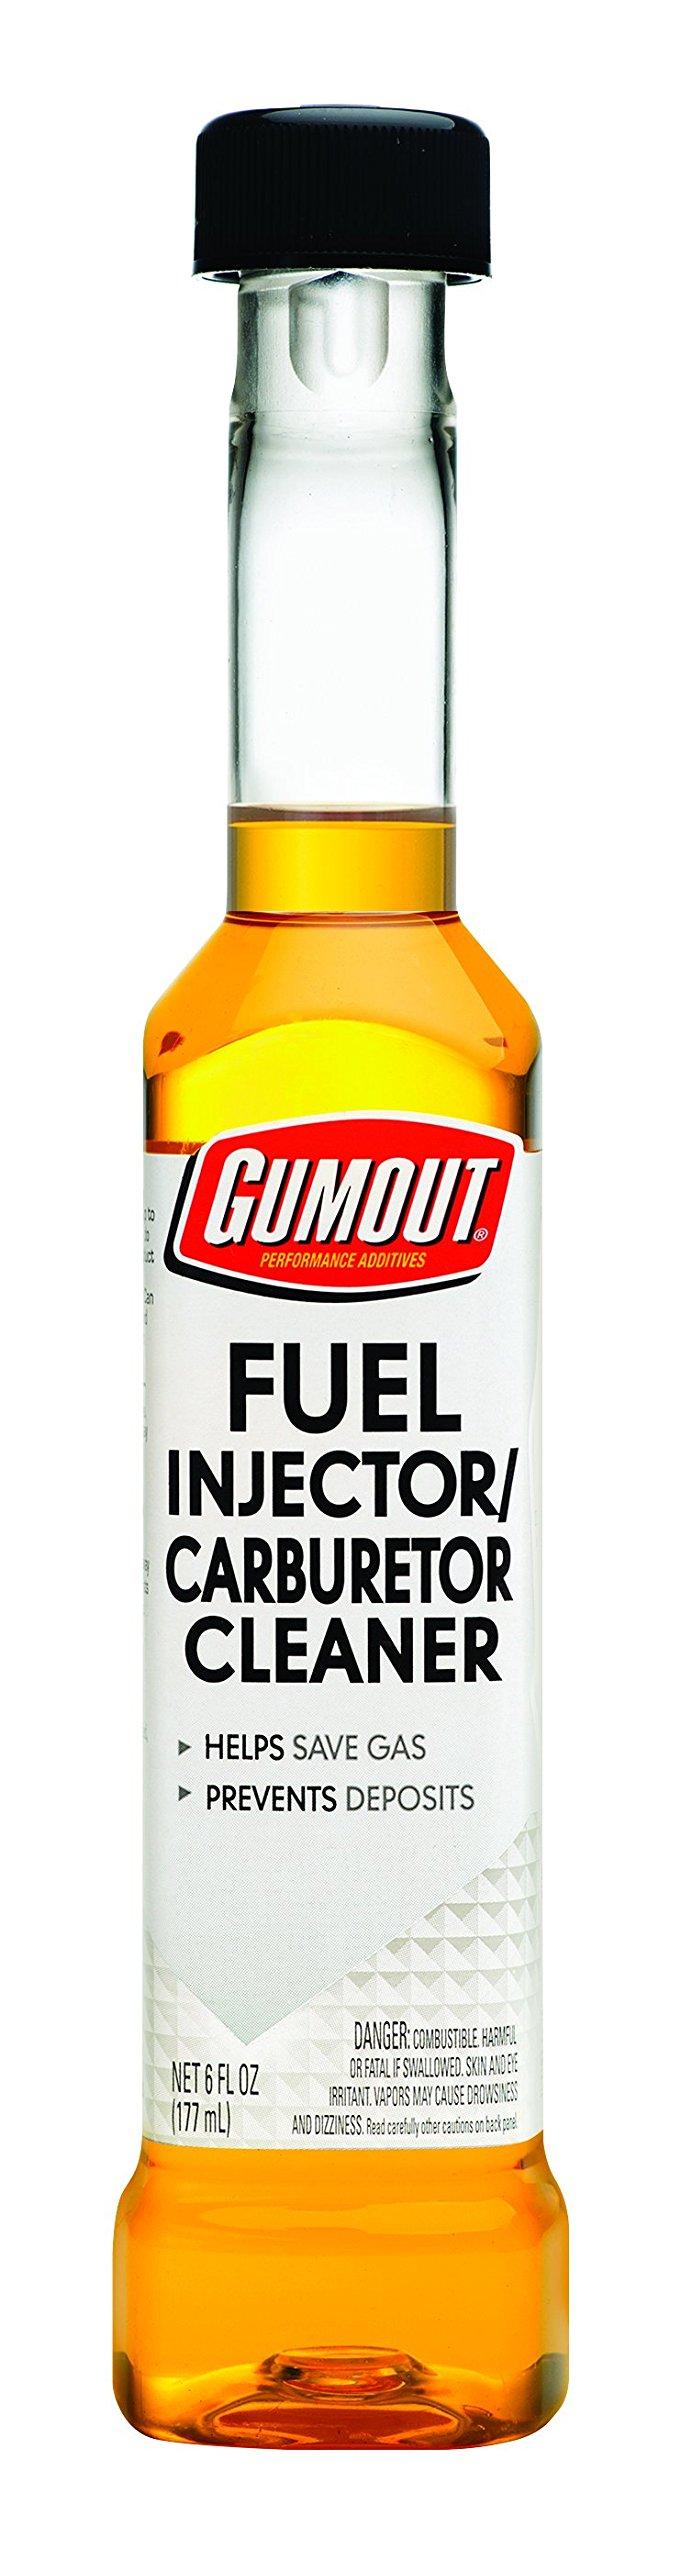 Gumout 800001373-12PK Carburetor/Fuel Injector Cleaner (12/6Oz)